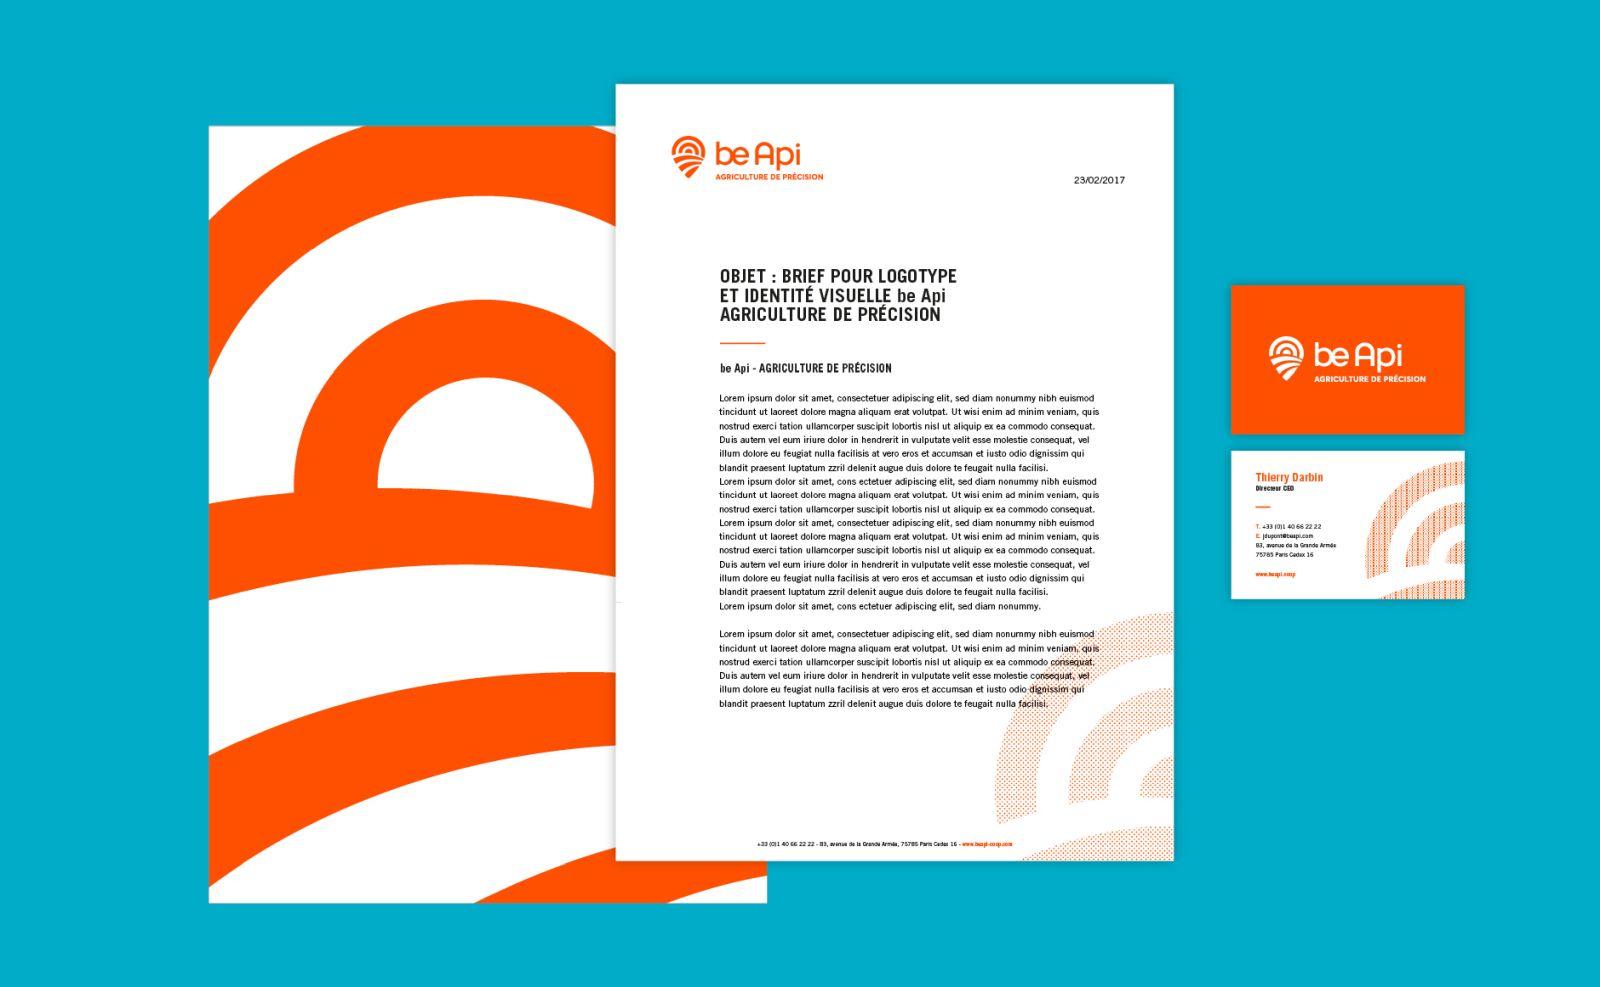 creative branding design of be api by grapheine